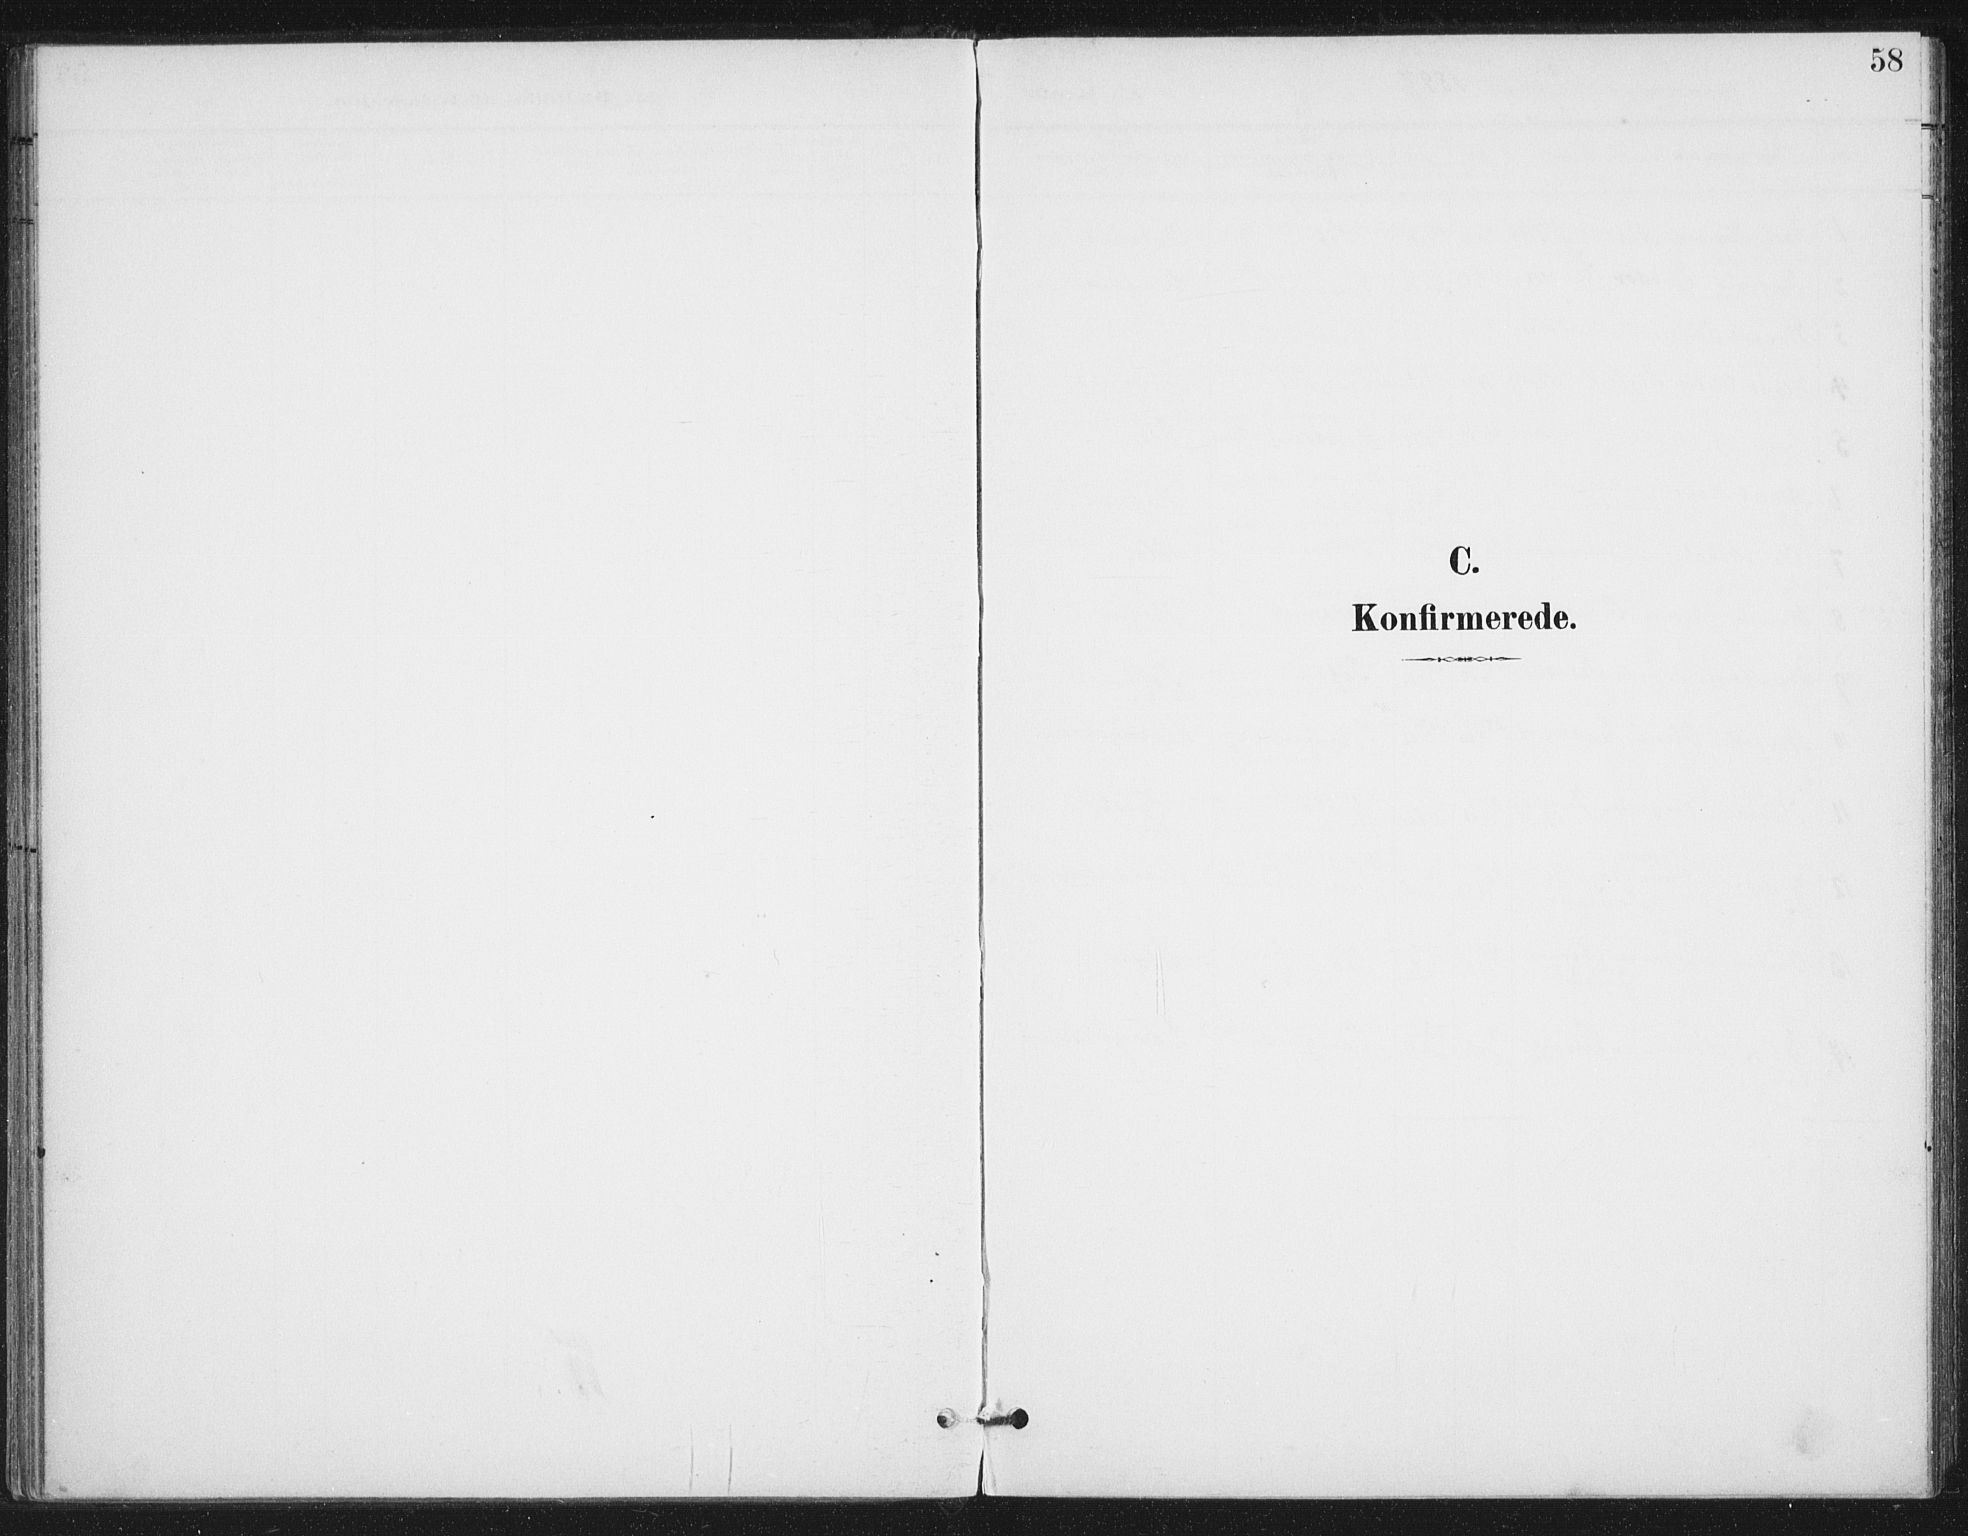 SAT, Ministerialprotokoller, klokkerbøker og fødselsregistre - Nordland, 894/L1356: Ministerialbok nr. 894A02, 1897-1914, s. 58